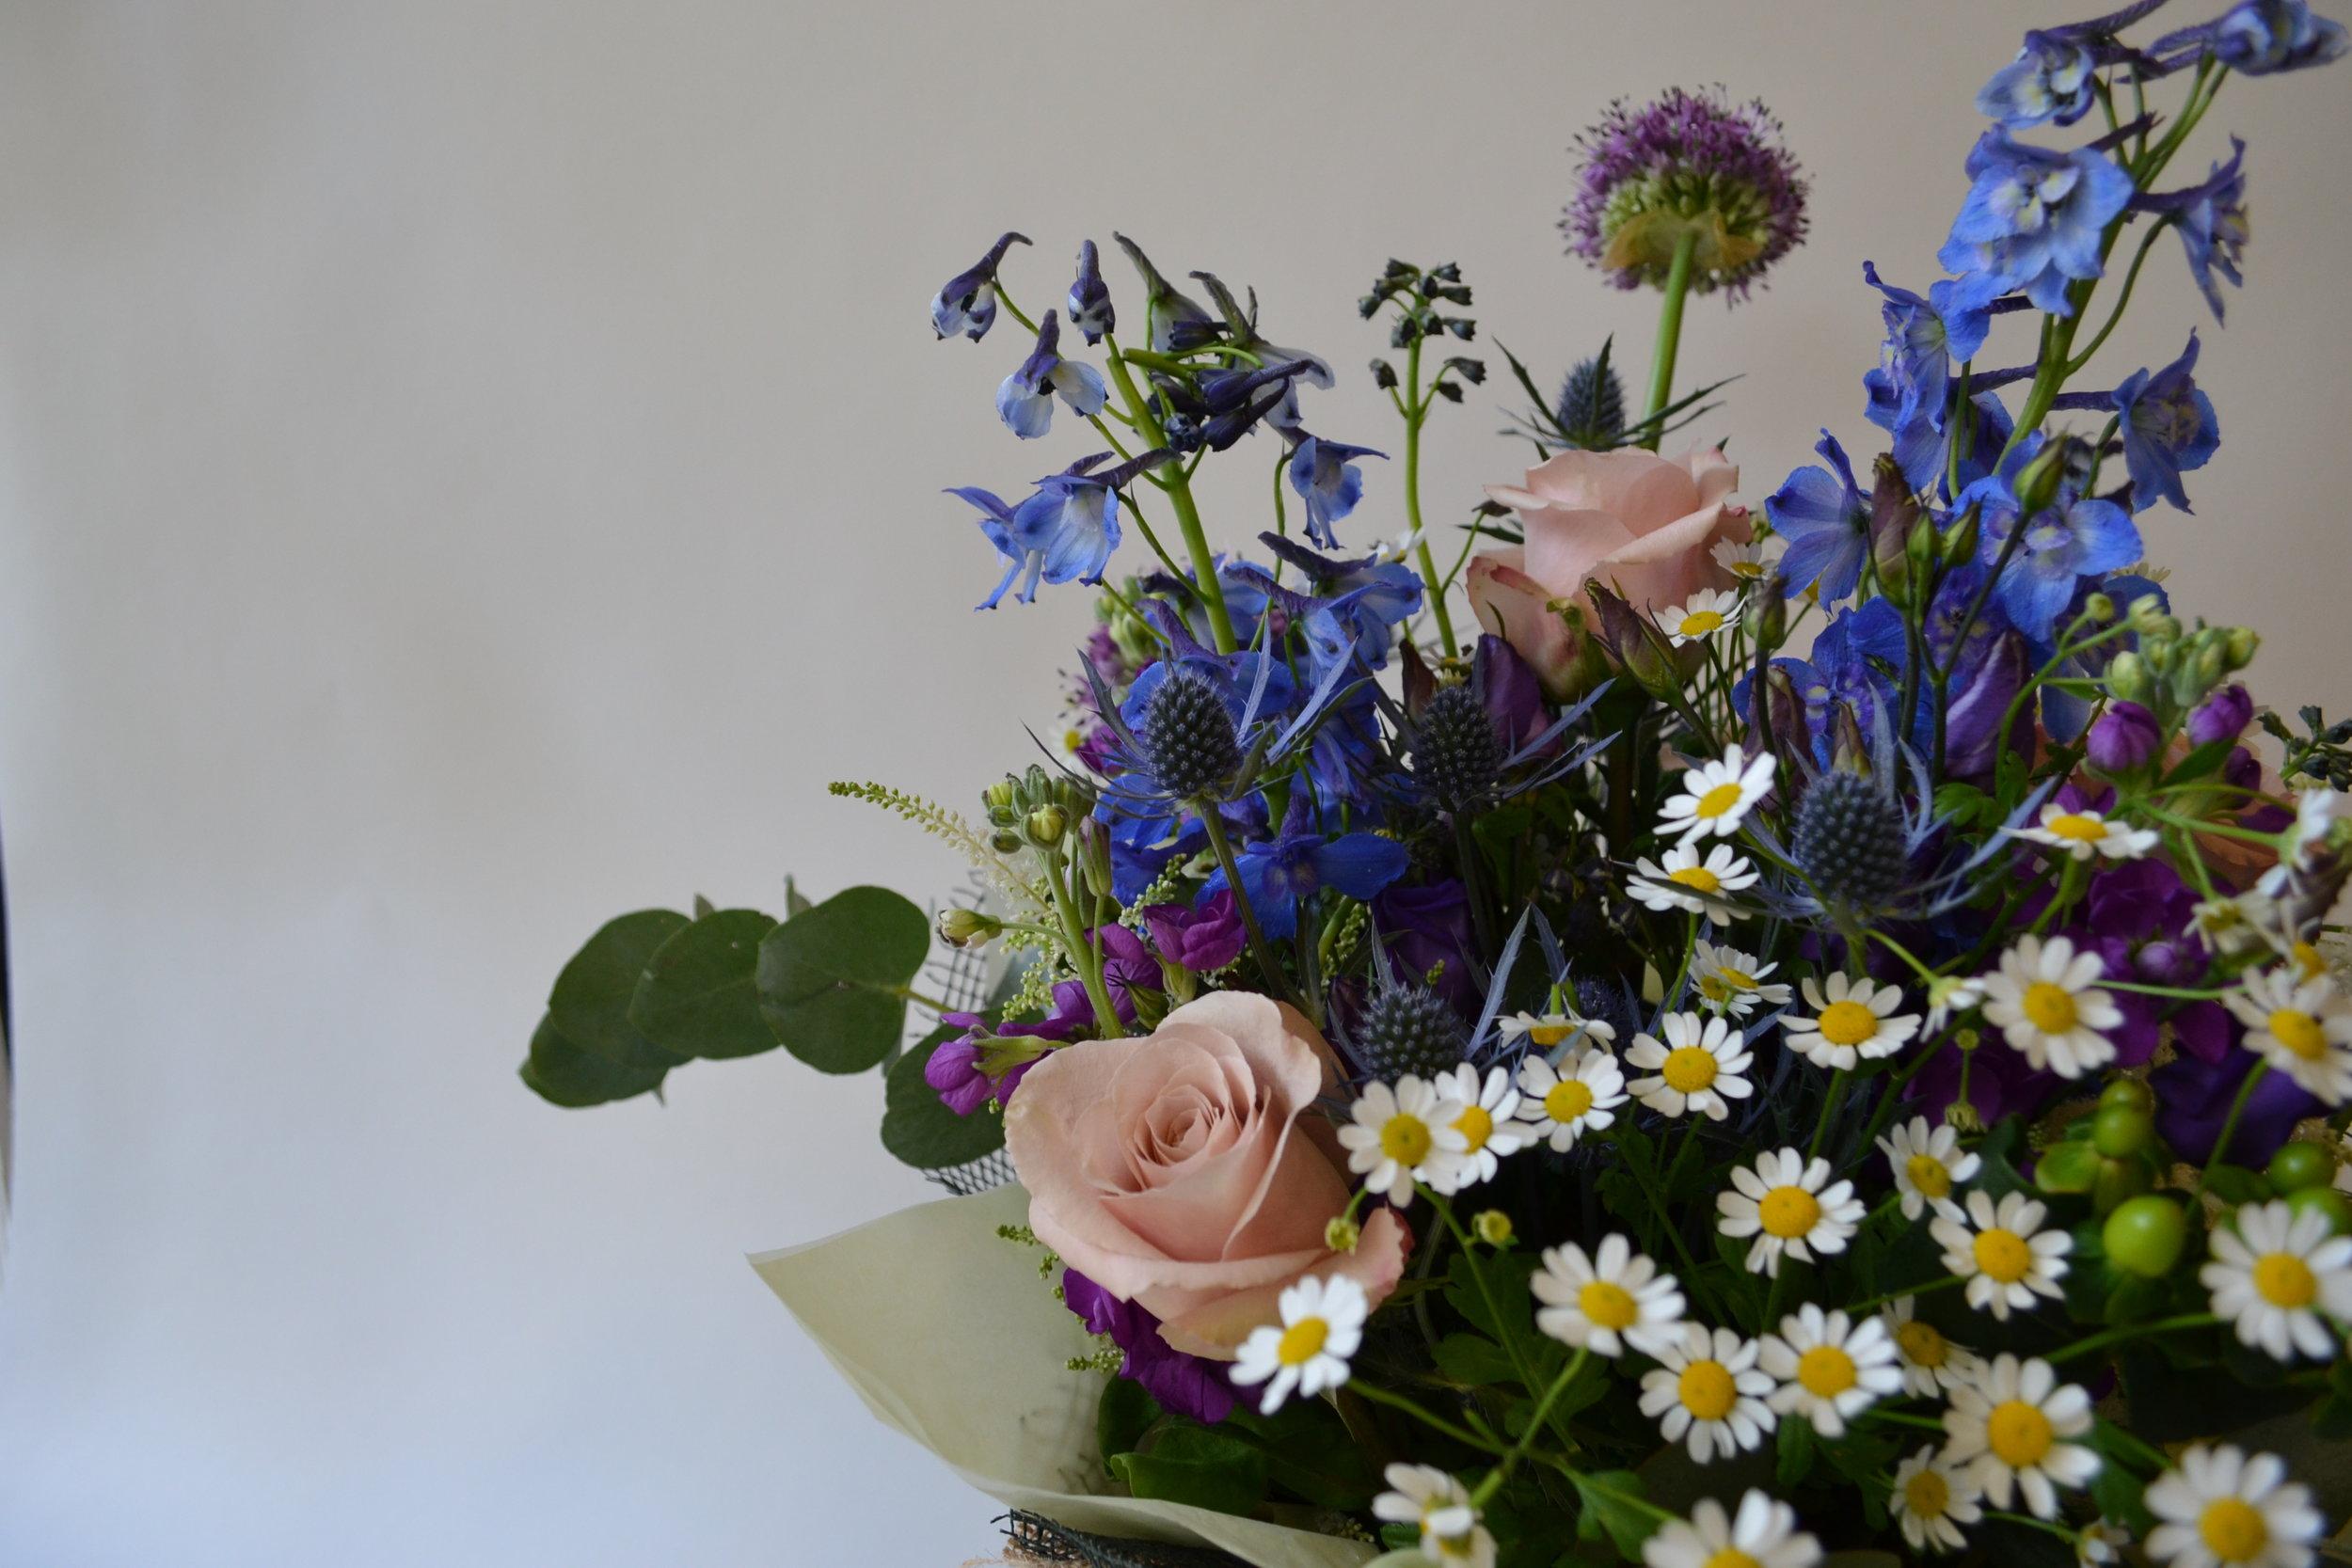 floom_plantology_Peace_Gardens_Delphinium_Rose_Quicksand_Eryngium_3.JPG